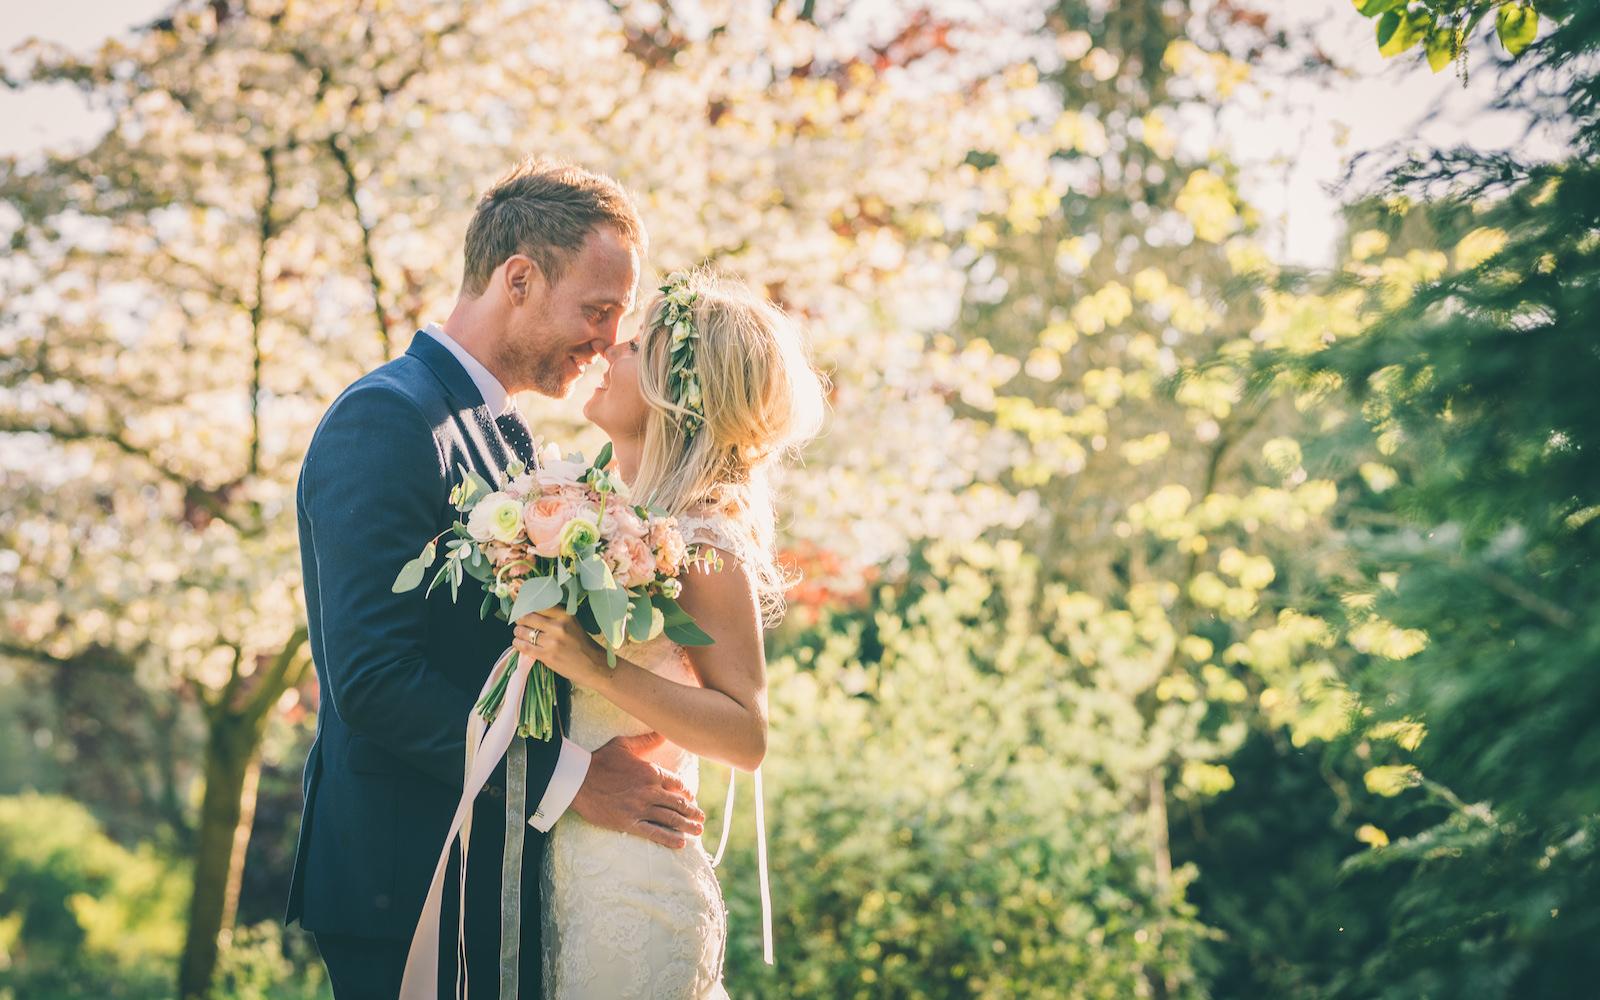 Rob Tarren UK Wedding Photography – Part Five